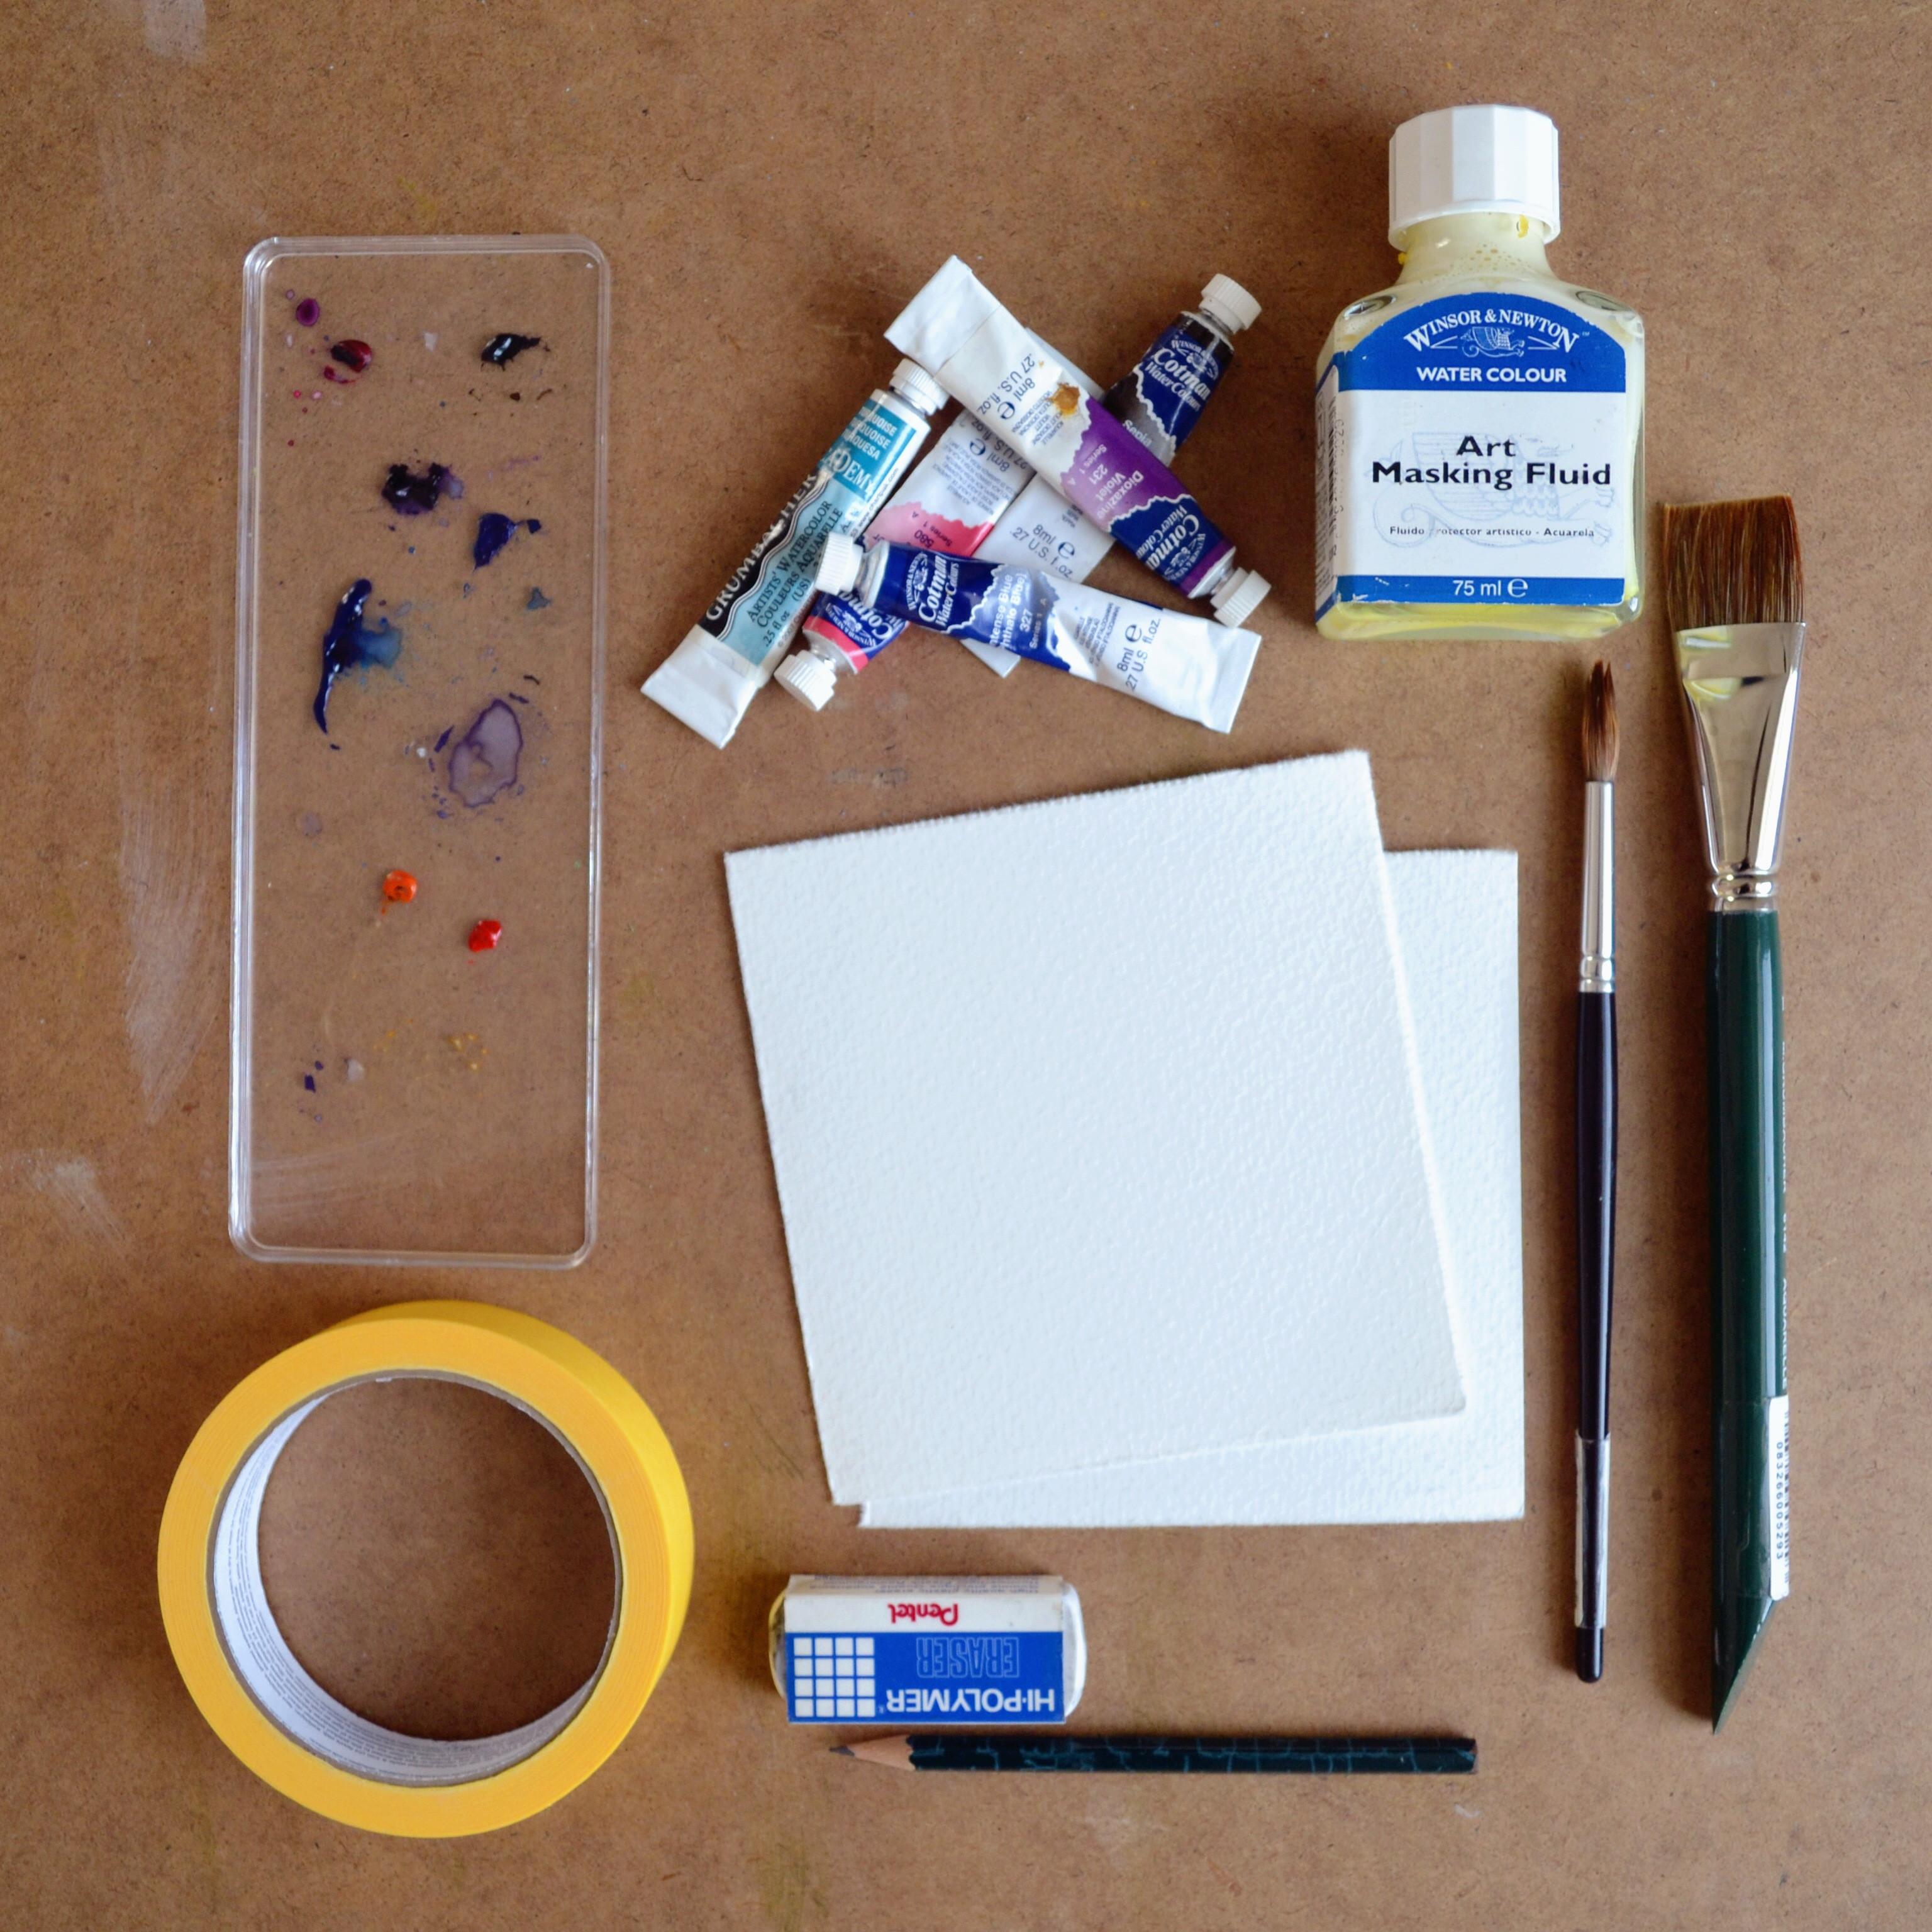 DIY Masking Fluid  Galaxy Watercolor Wall Art with Masking Fluid DIY